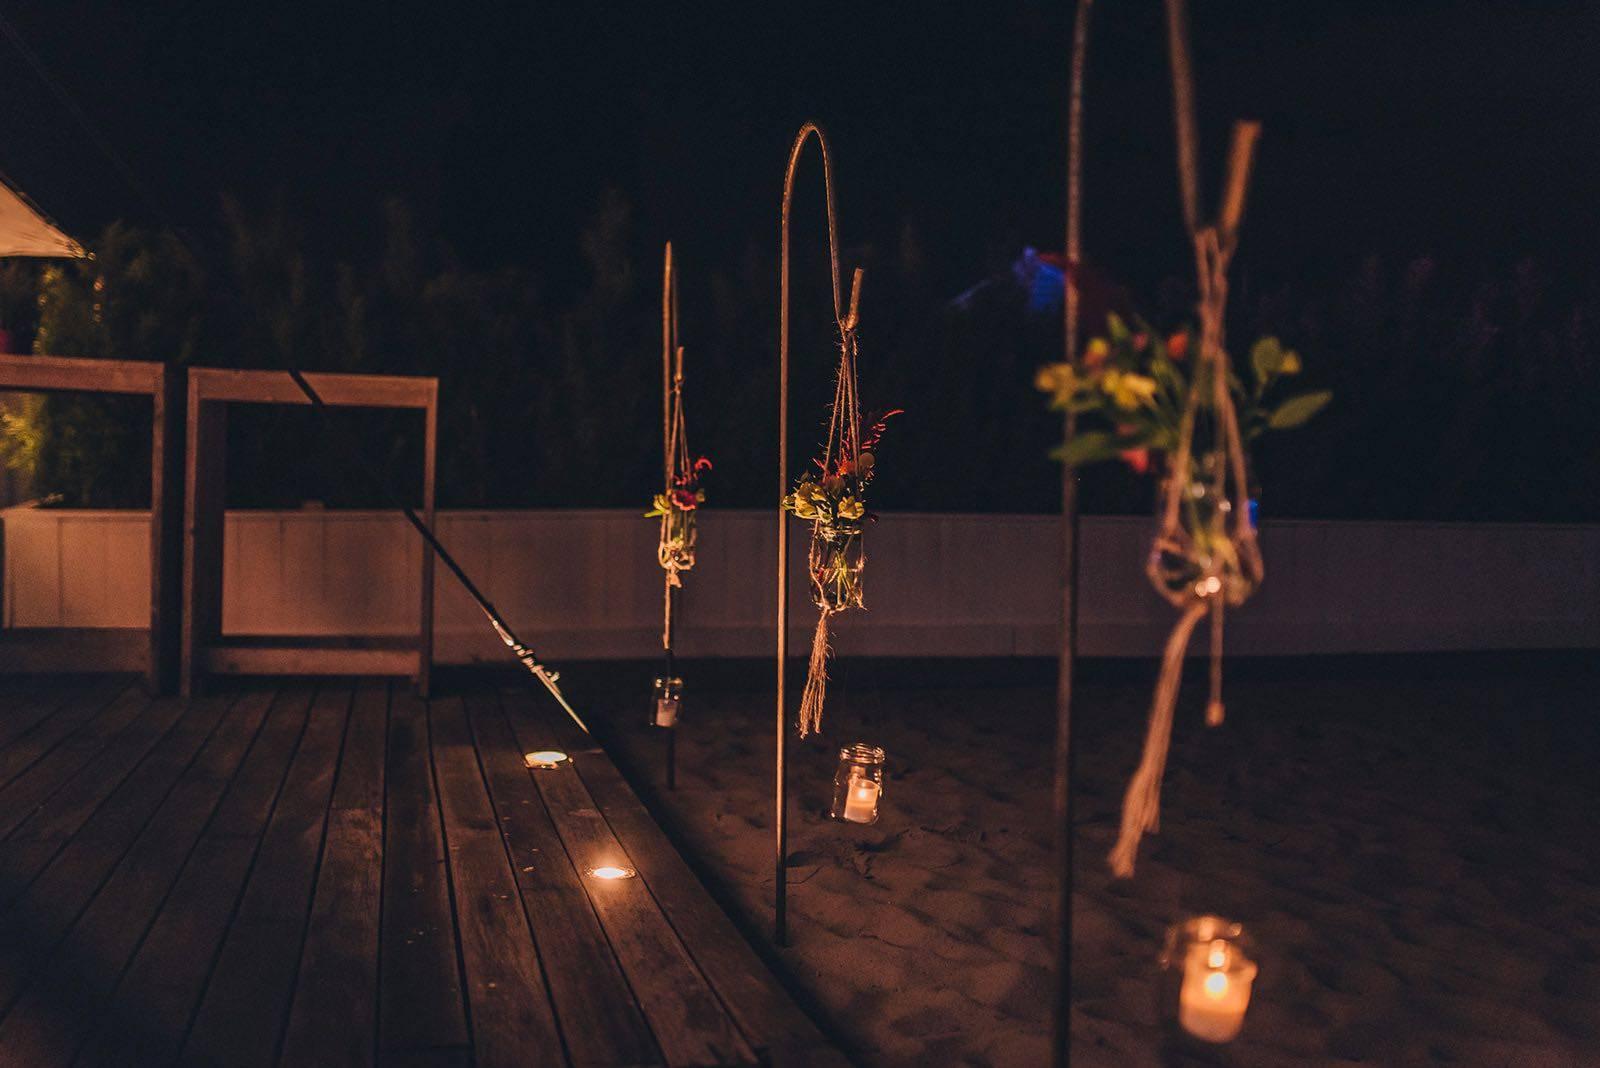 Strantwerpen - Feestzaal - Trouwzaal - Trouwen op het Strand - Fotograaf Aiki Photography - House of Weddings - 9